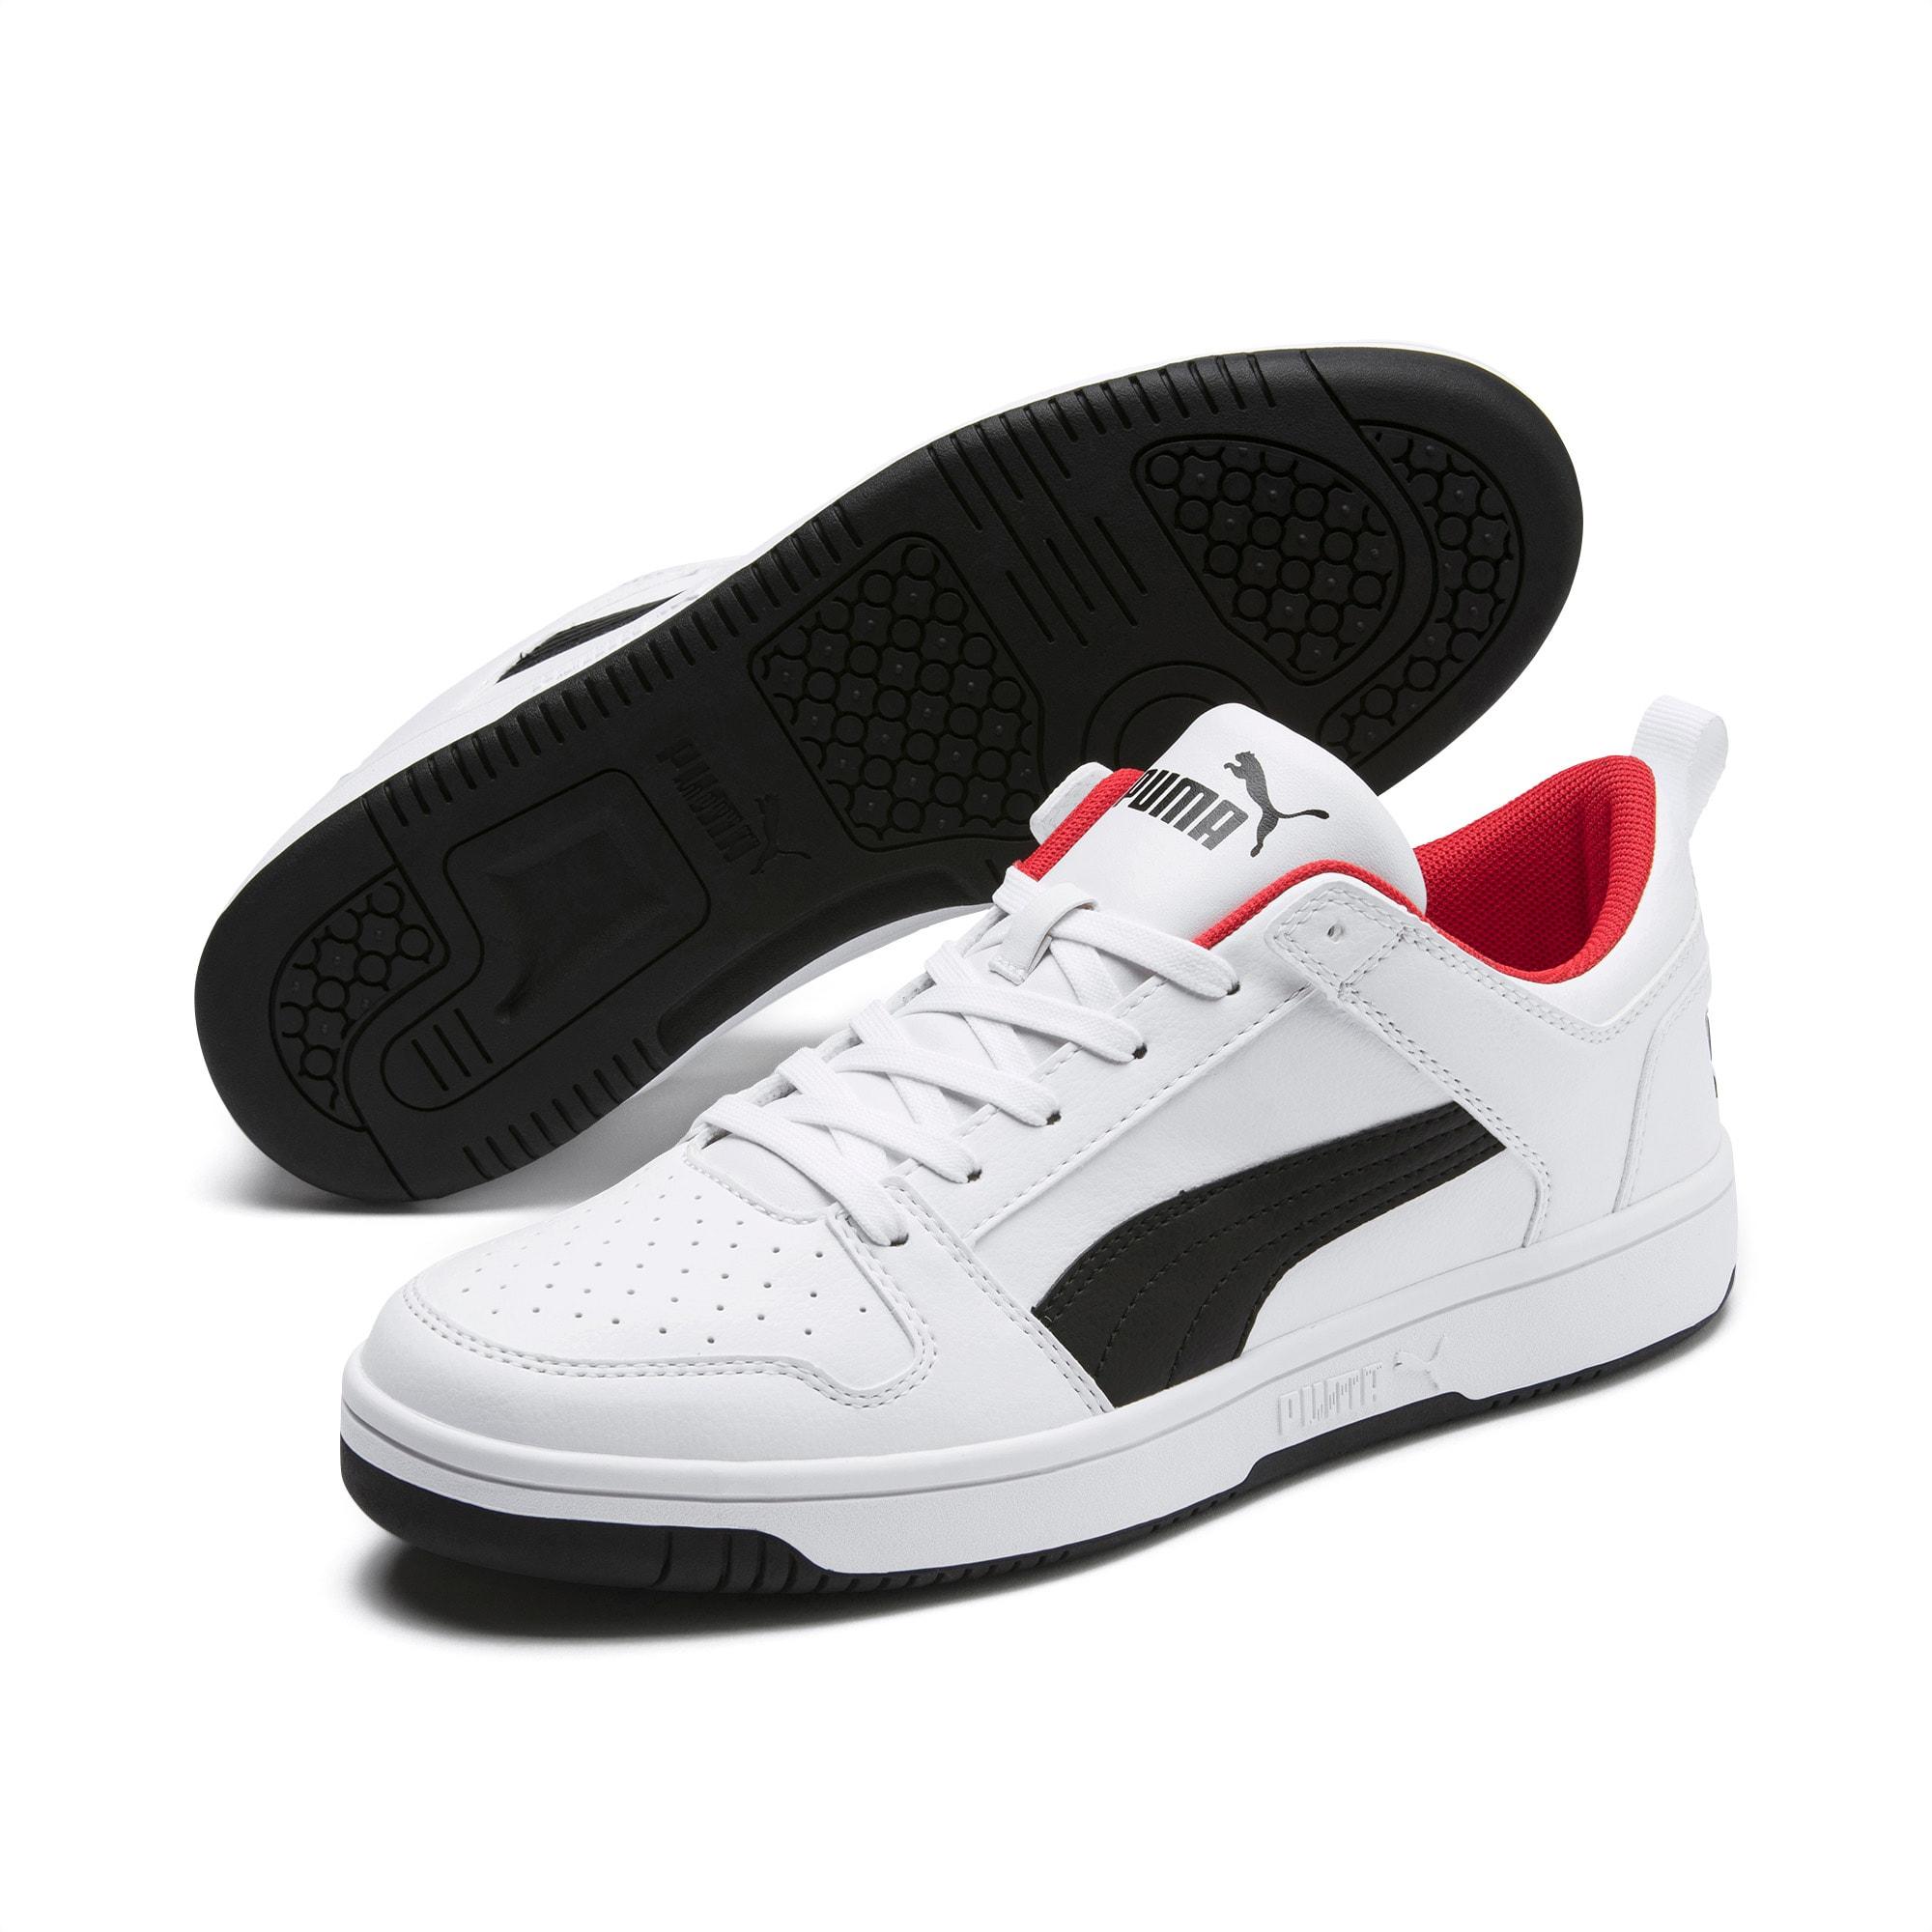 PUMA Rebound LayUp Lo Sneakers